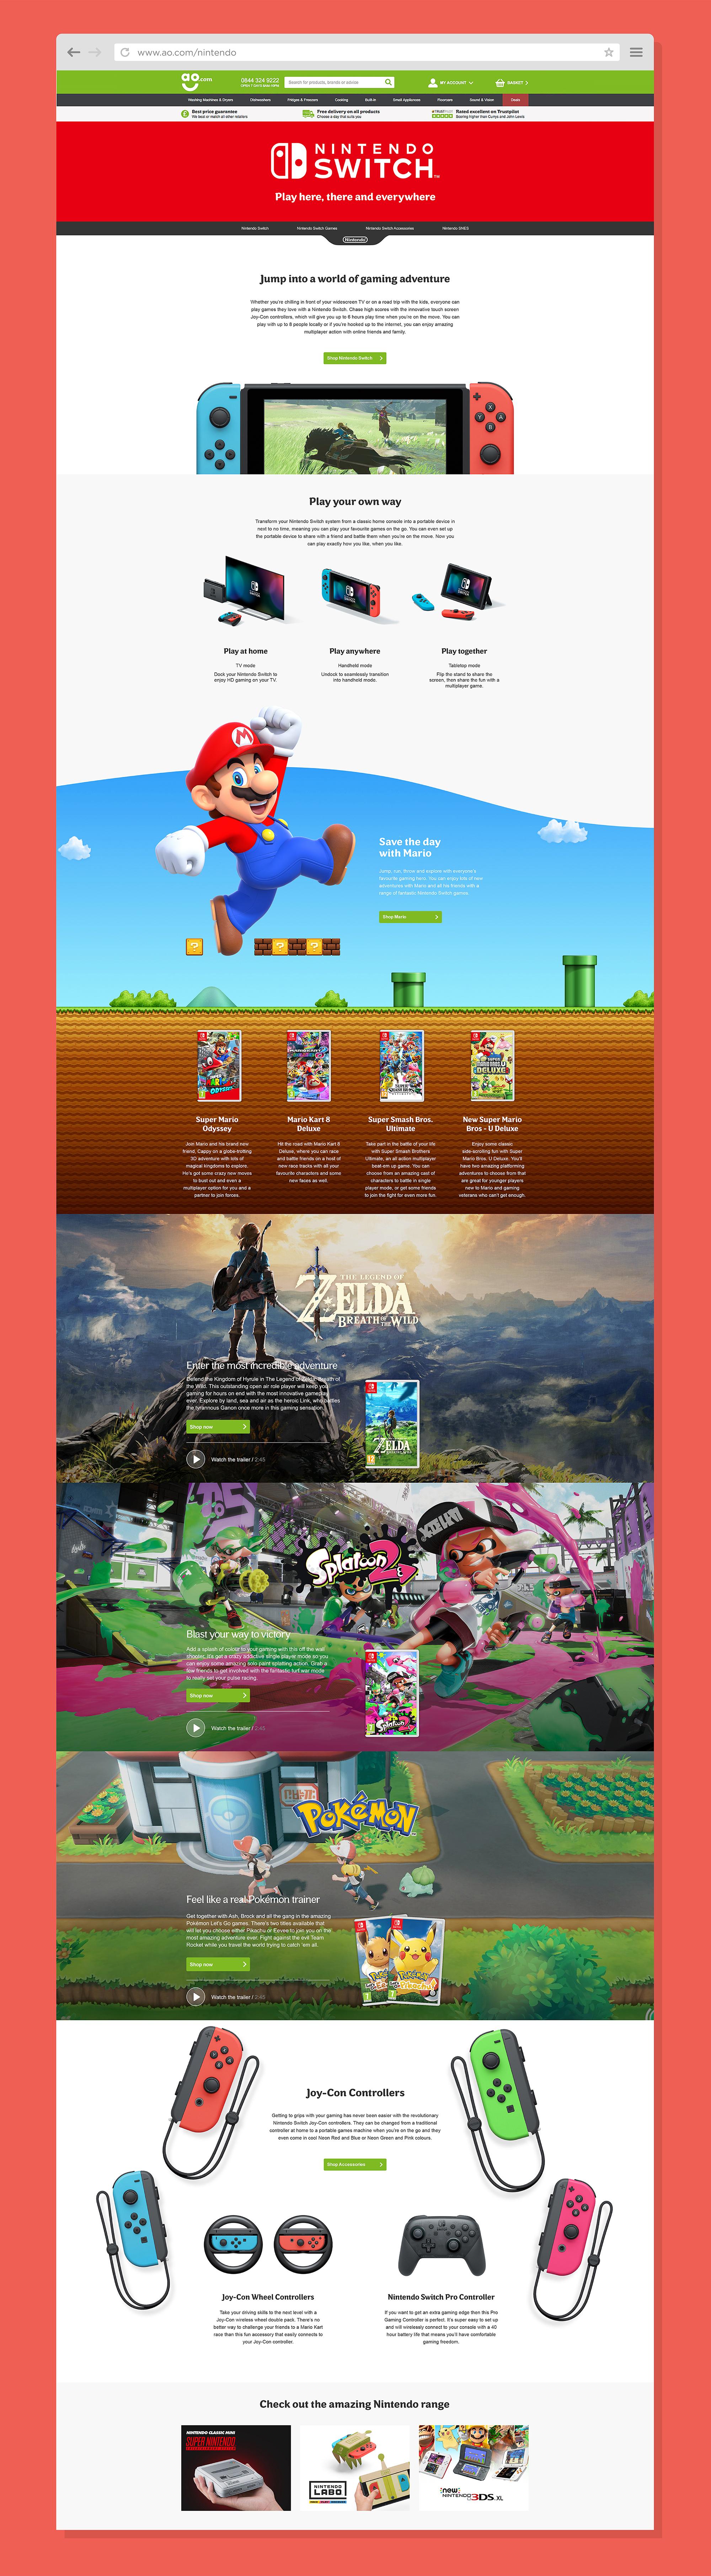 Nintendo-01.jpg